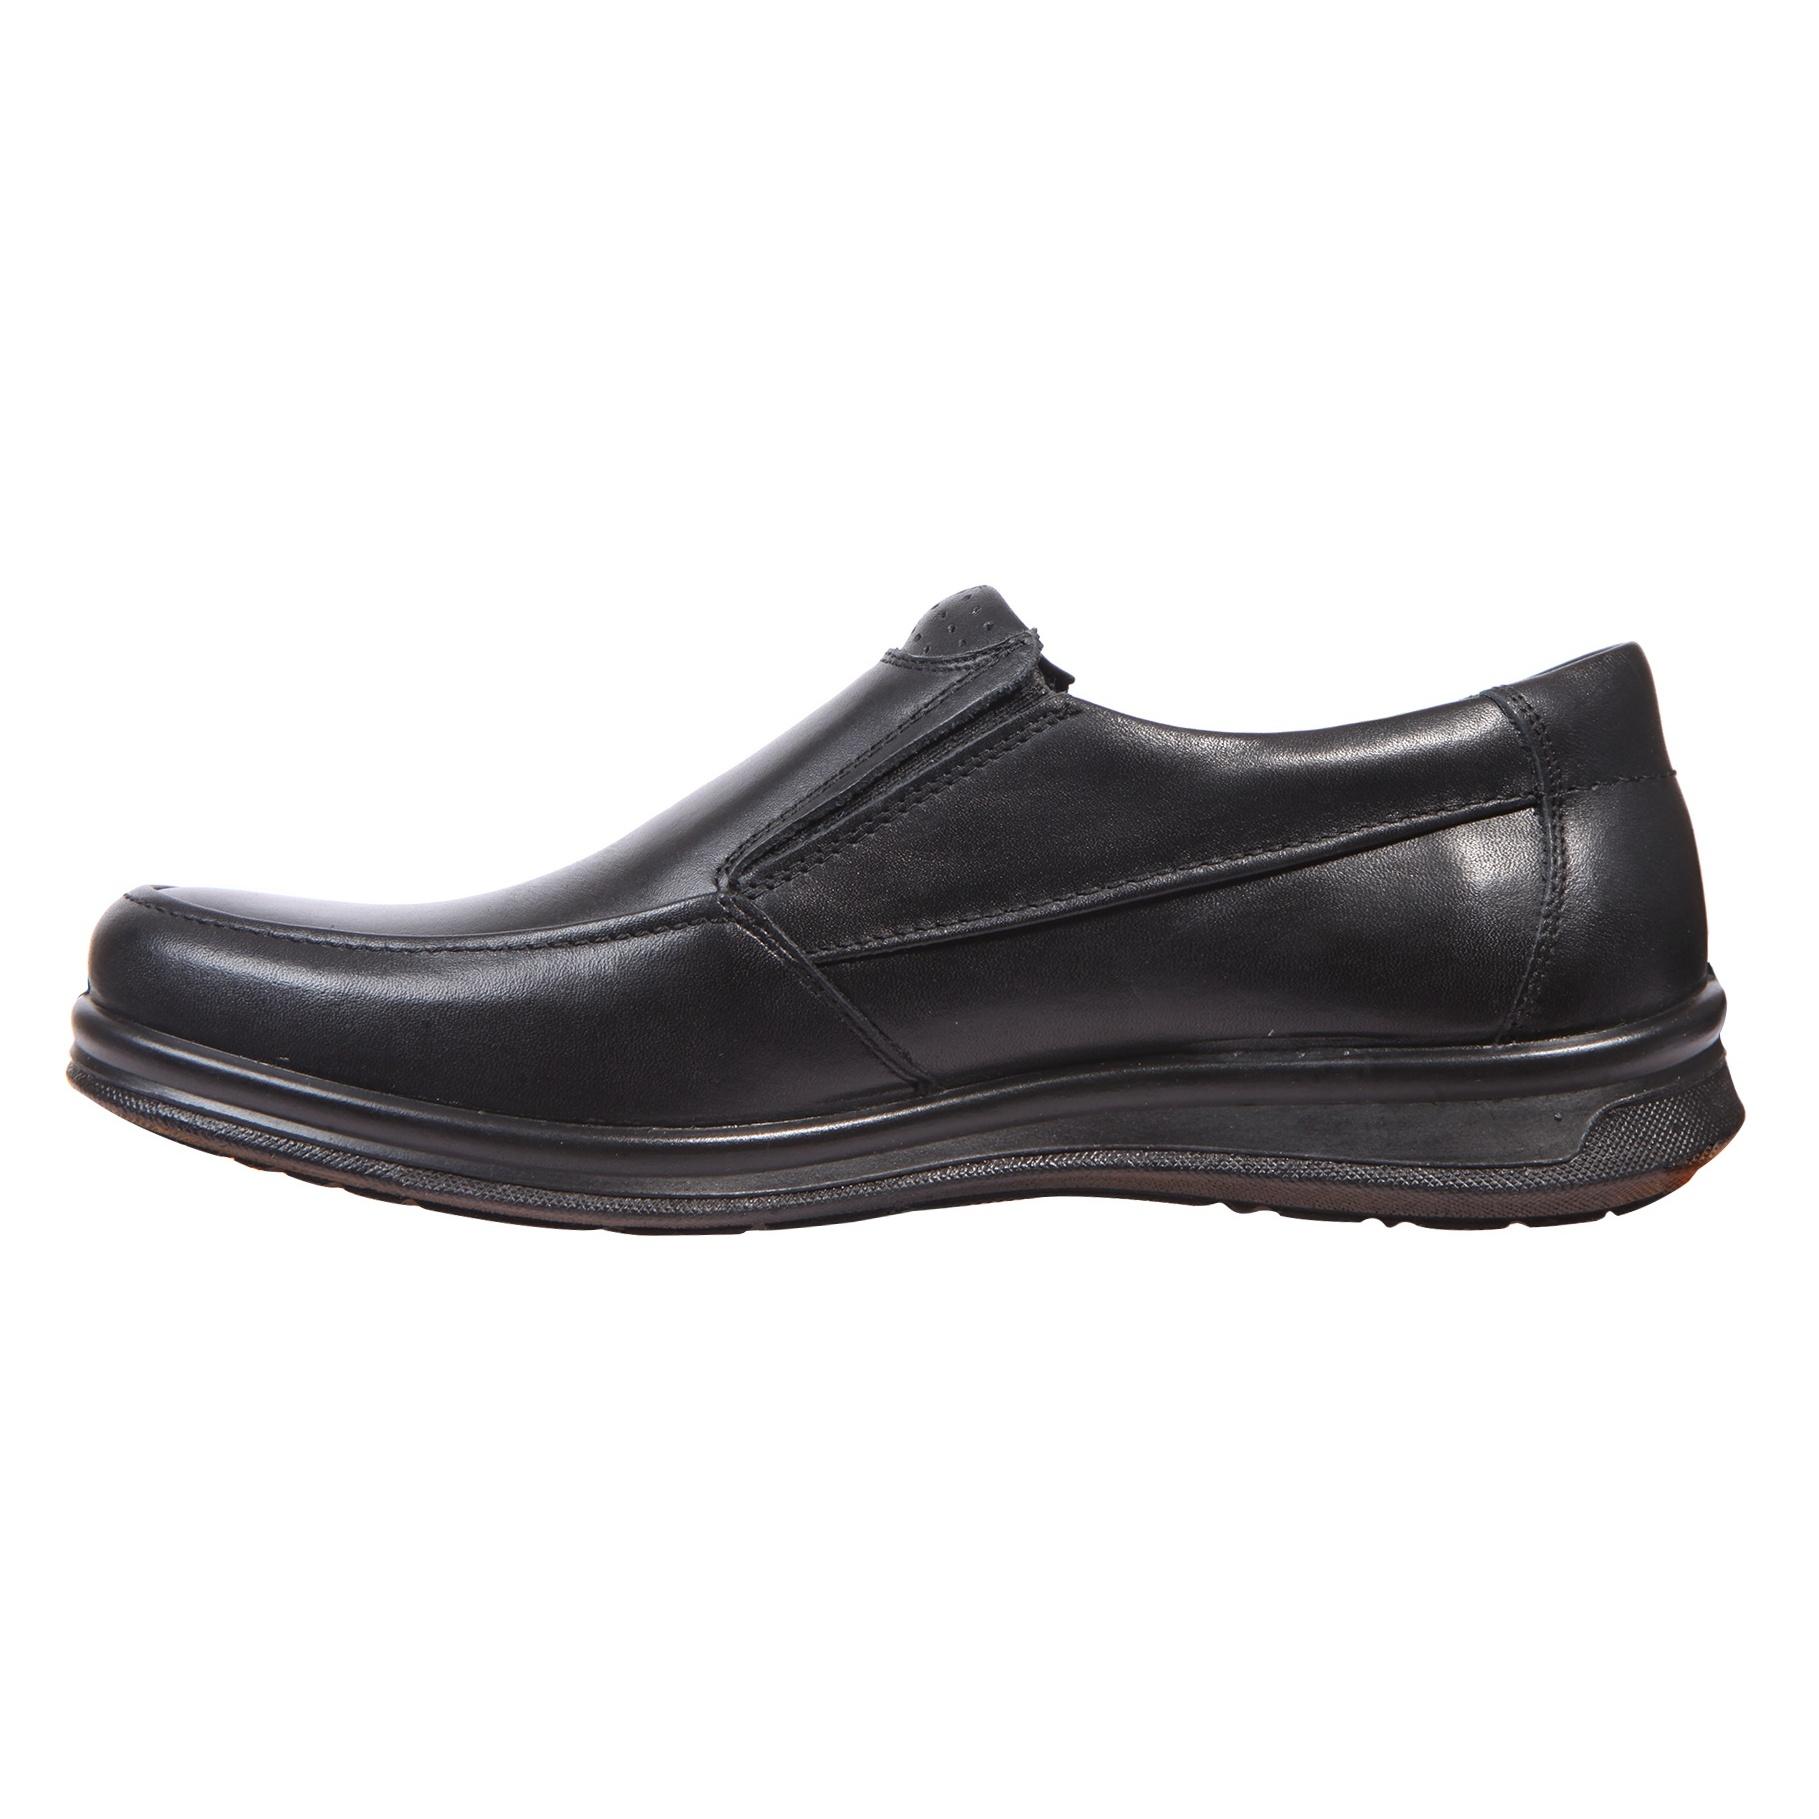 کفش روزمره مردانه پای آرا مدل نیکنام کد 01